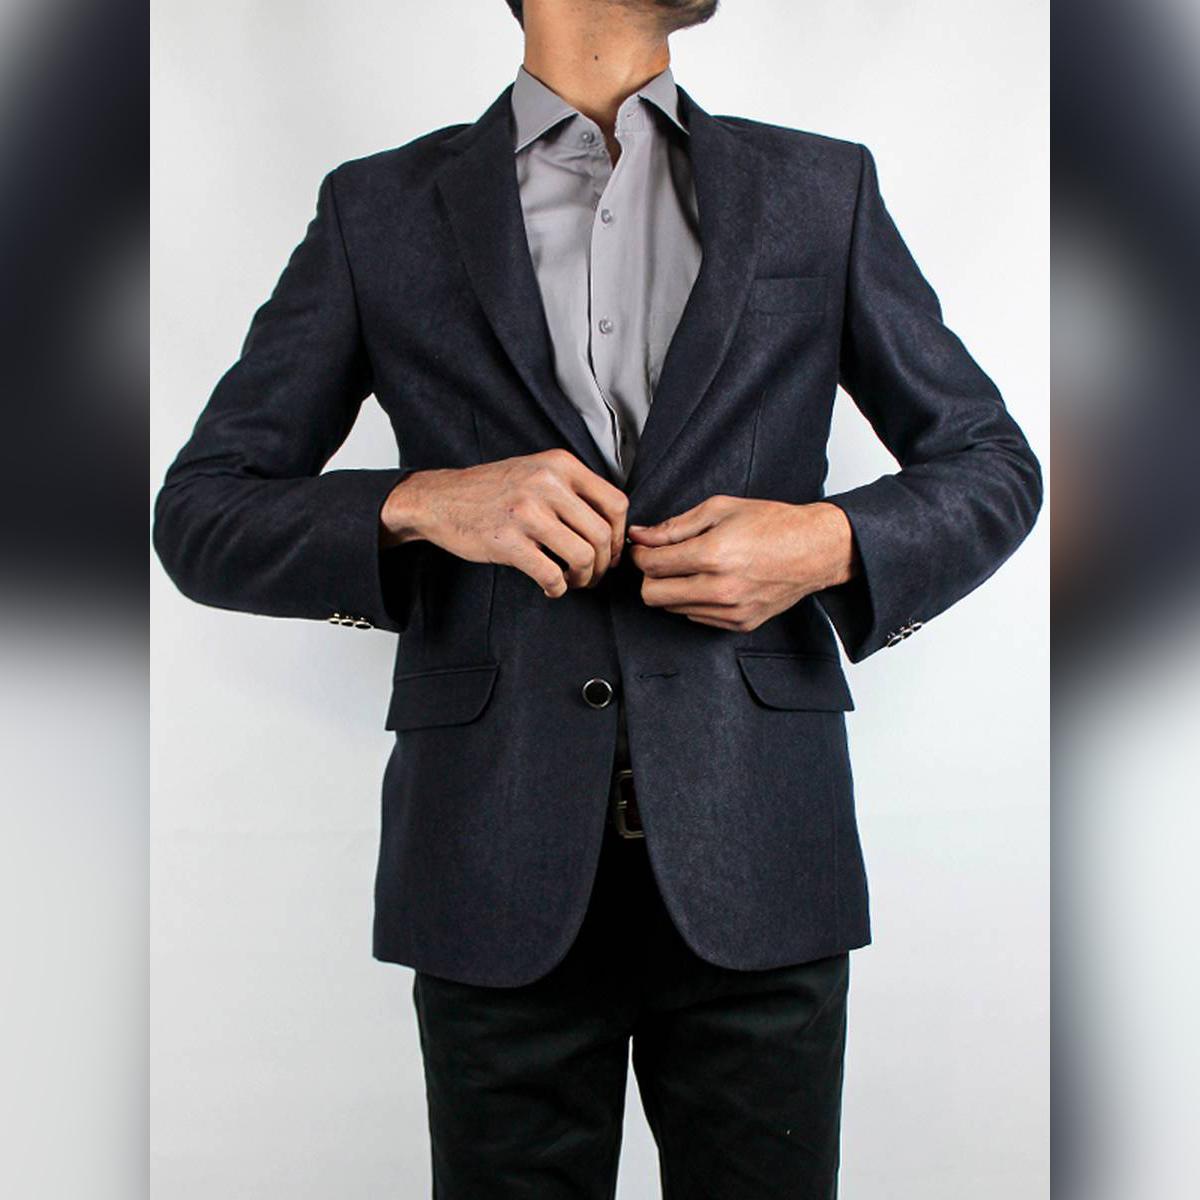 Cut Price Casual Coat Blazer for Men Tweed Navy Blue